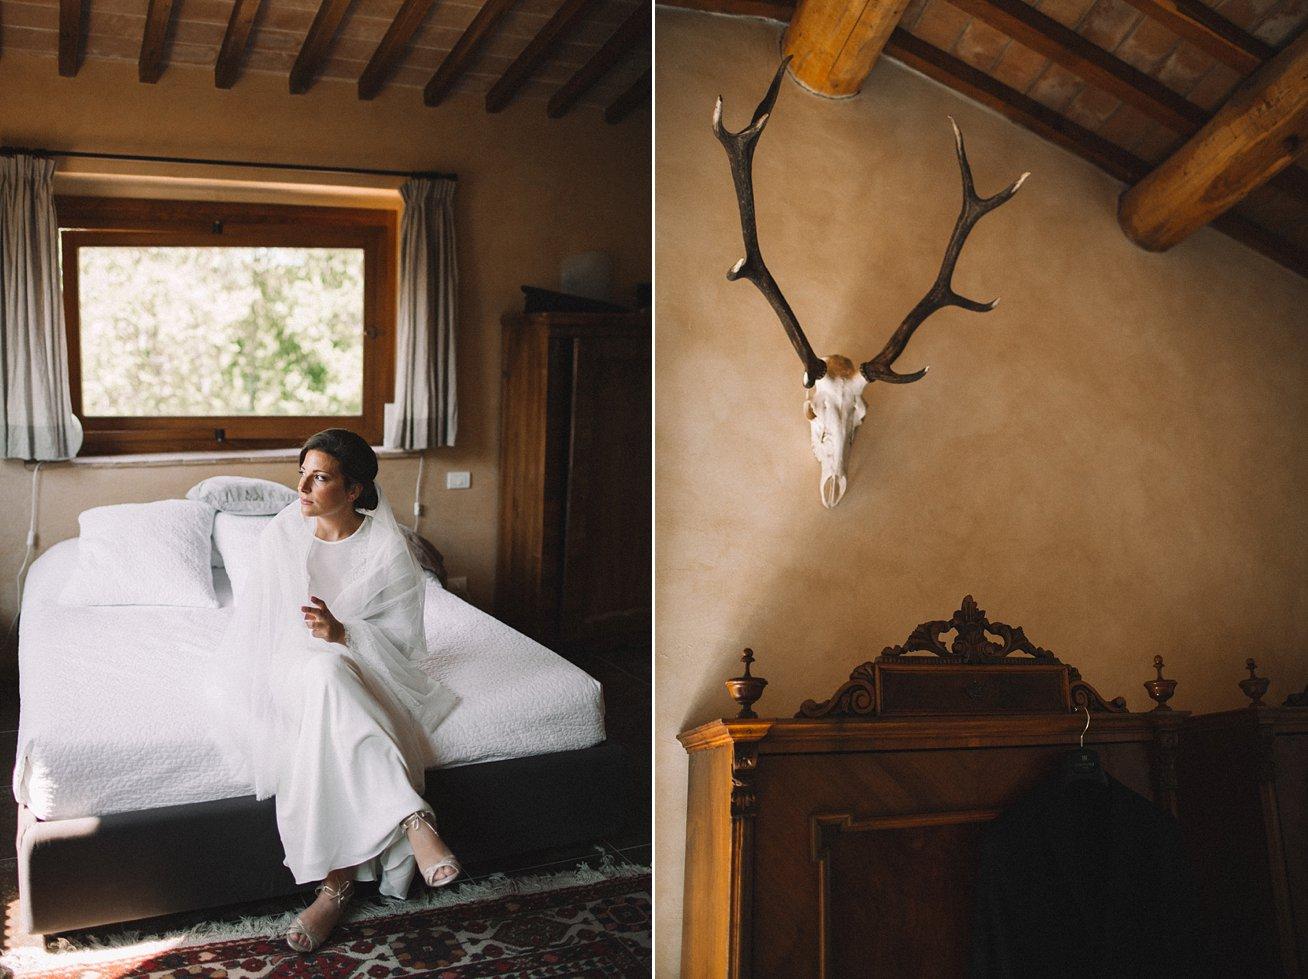 Amanda-Drost-Fotografie-Bruioft-Italie-Trouwen-buitenland-destination-wedding-italy_0096.jpg